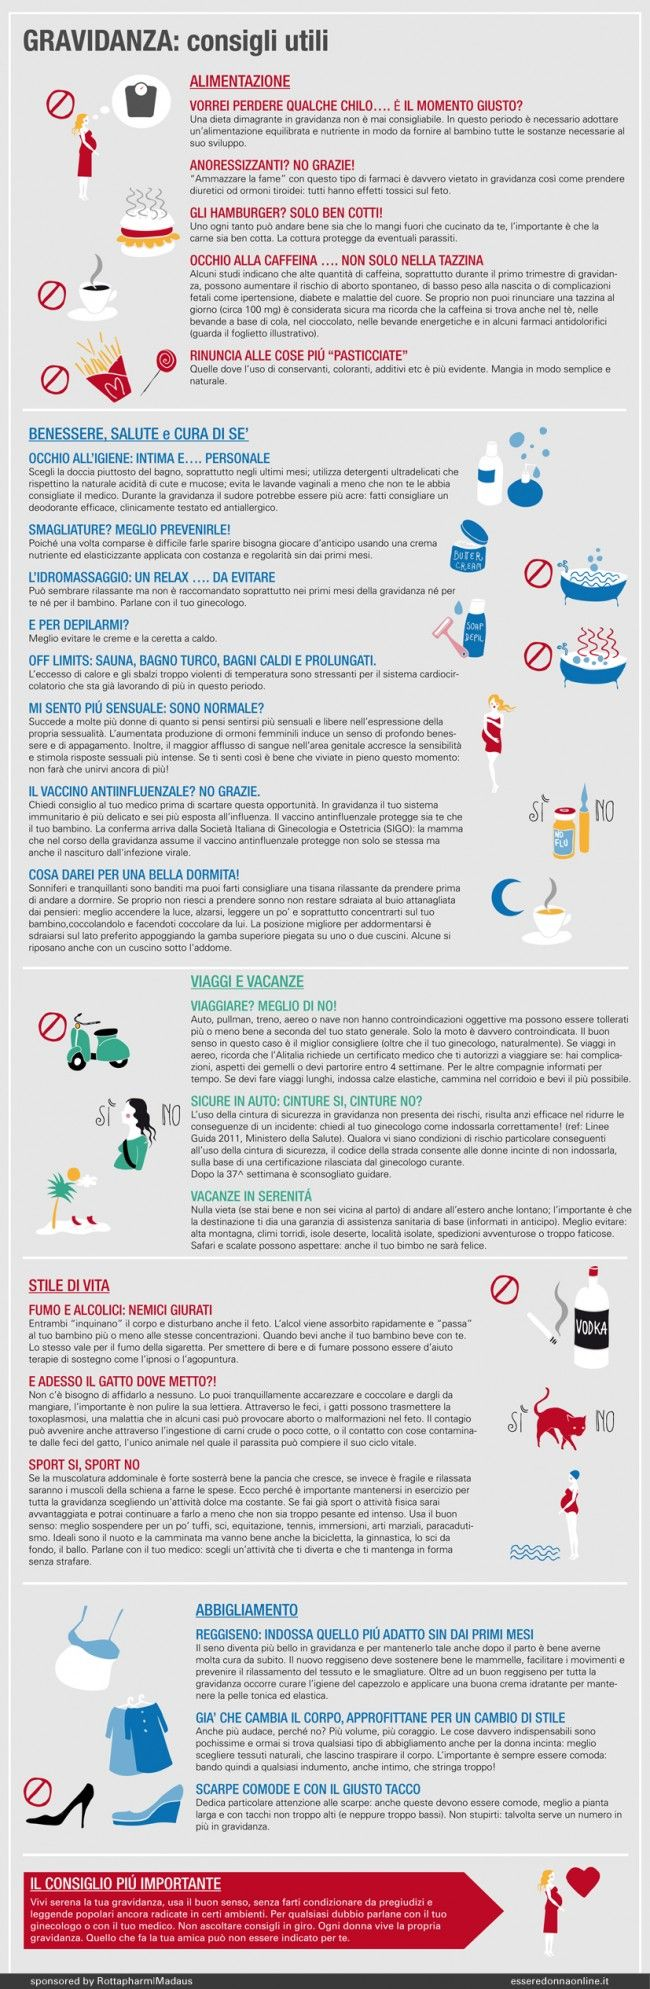 Gravidanza: consigli utili - Esseredonnaonline